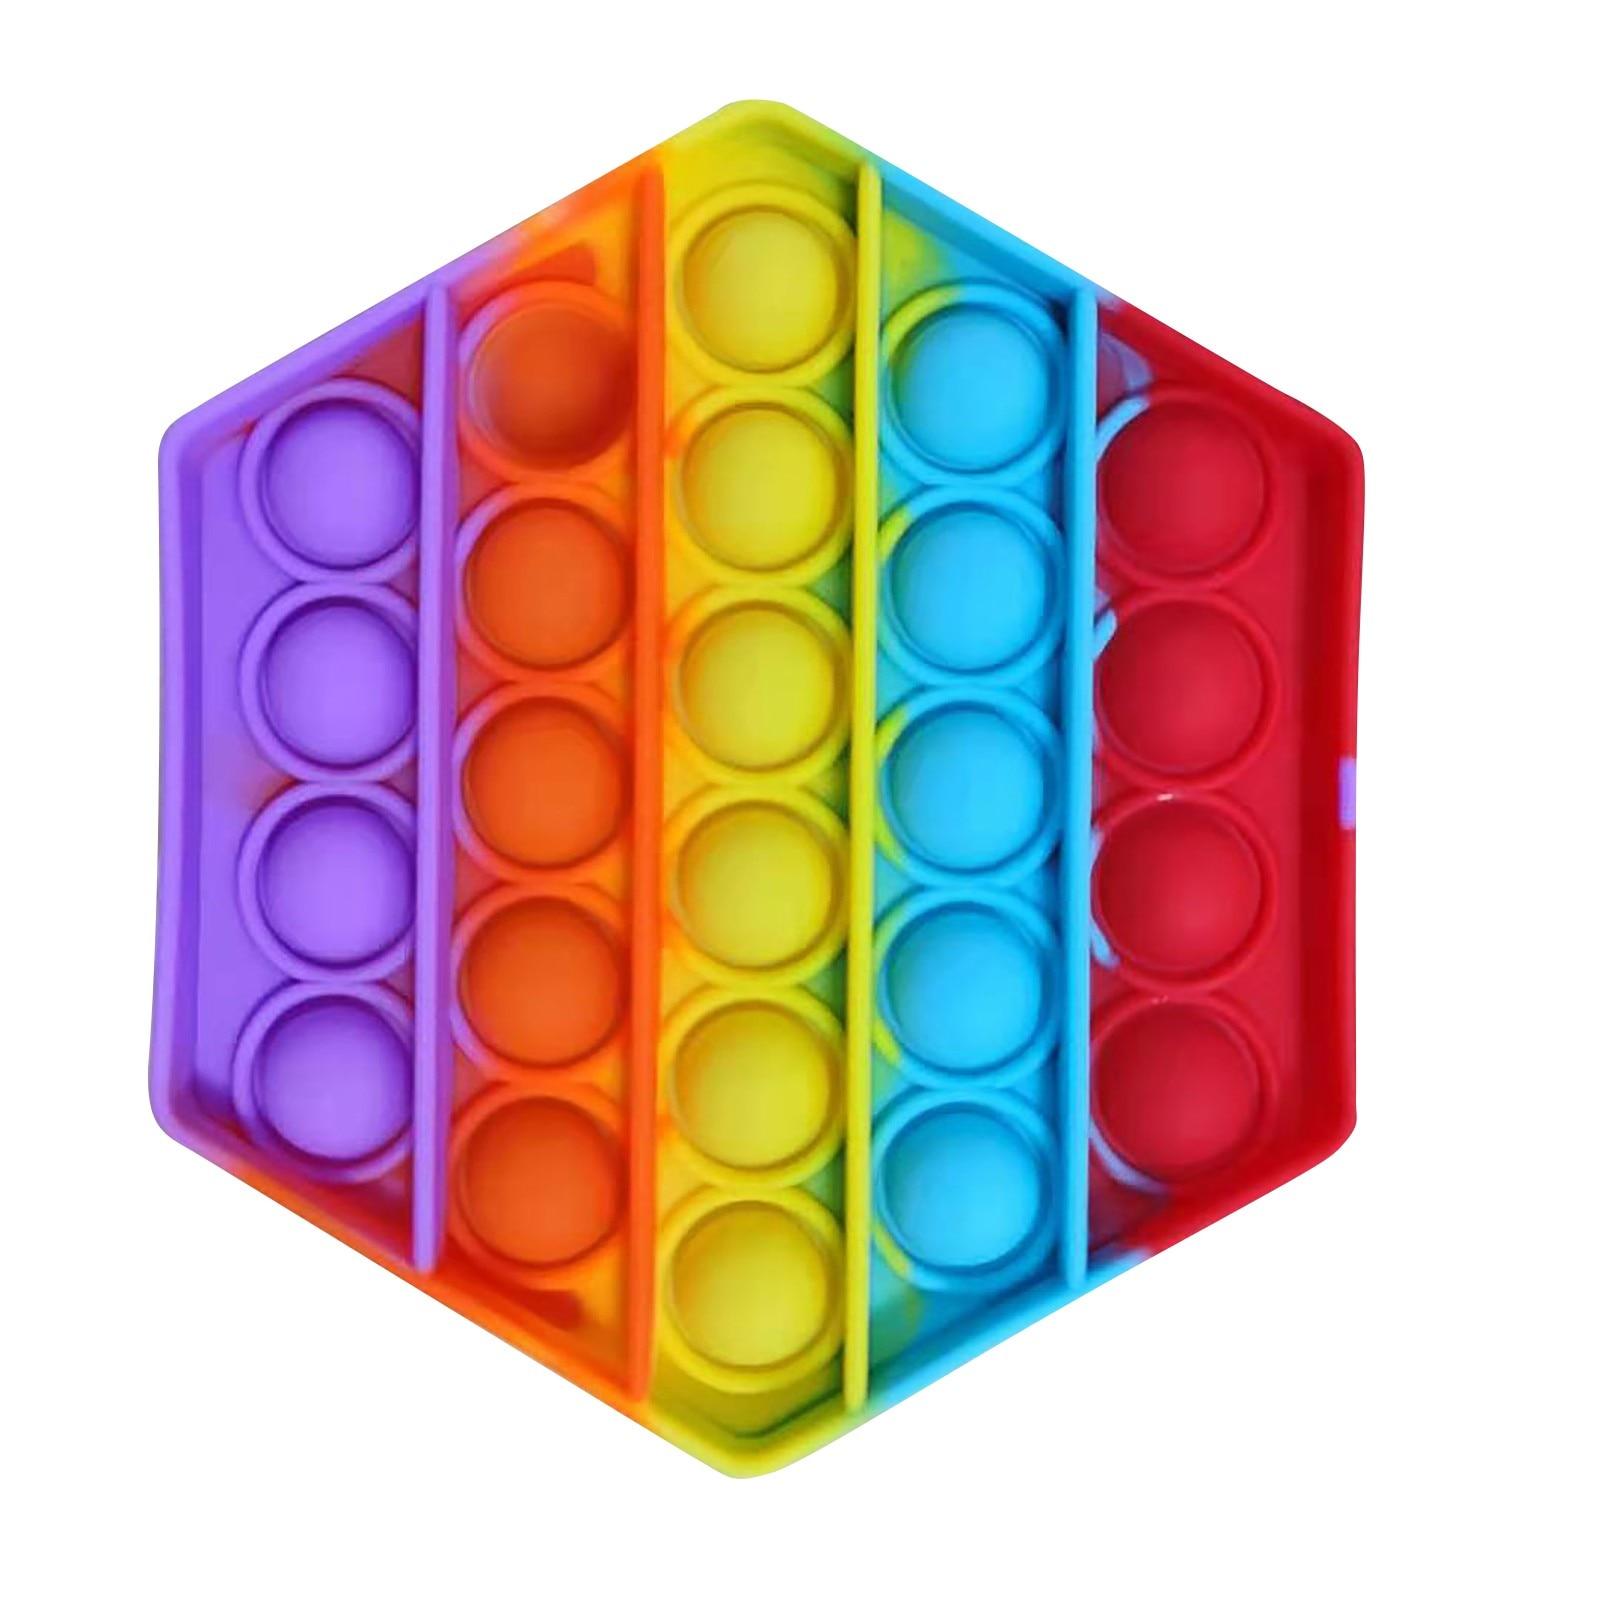 Sensory Toy Stress-Toys Fidget Reliver Rainbow-Push Children Adult It img2